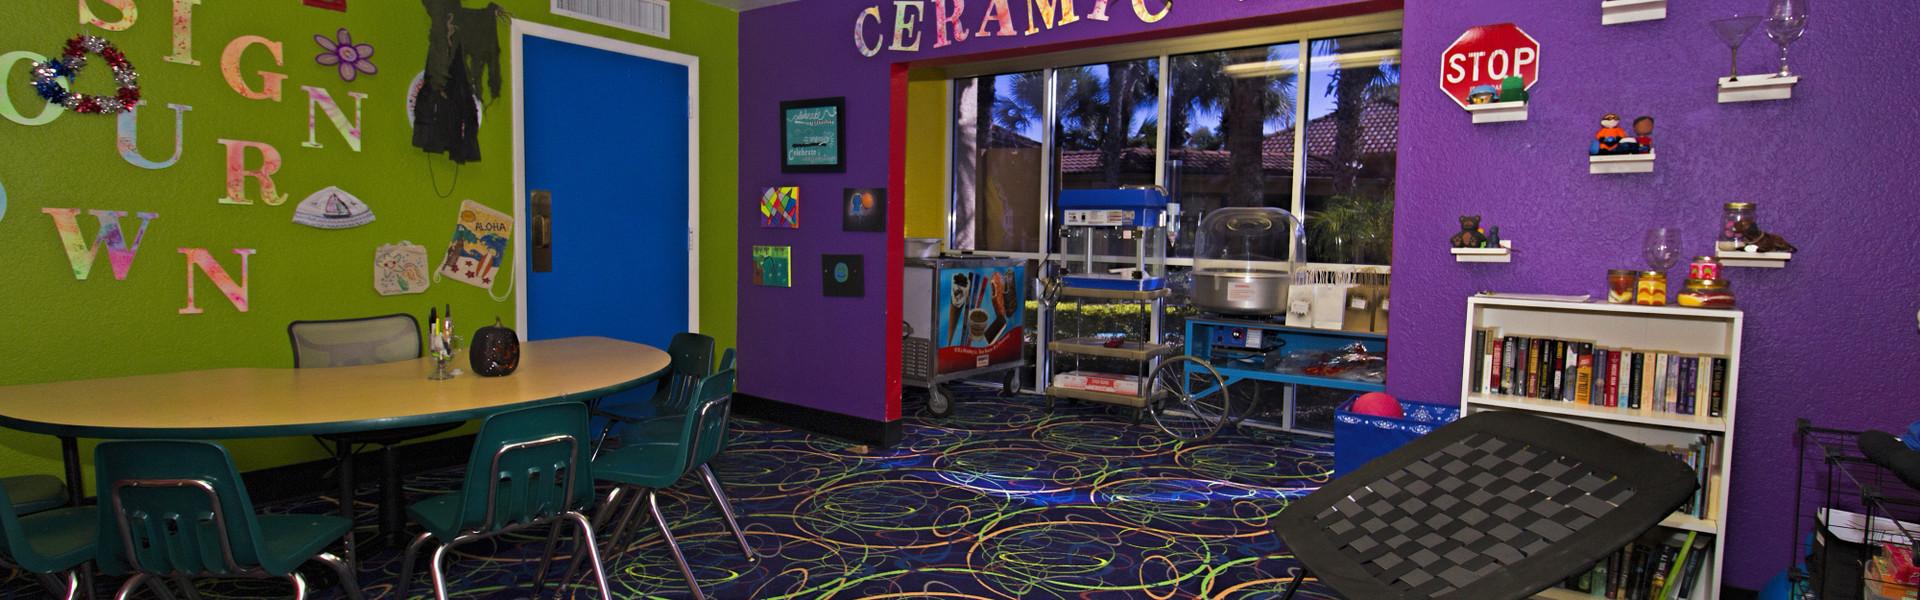 Things To Do In Lake Buena Vista Florida   Hotel Close to Sea World in Orlando, FL 32836   Westgate Blue Tree Resort